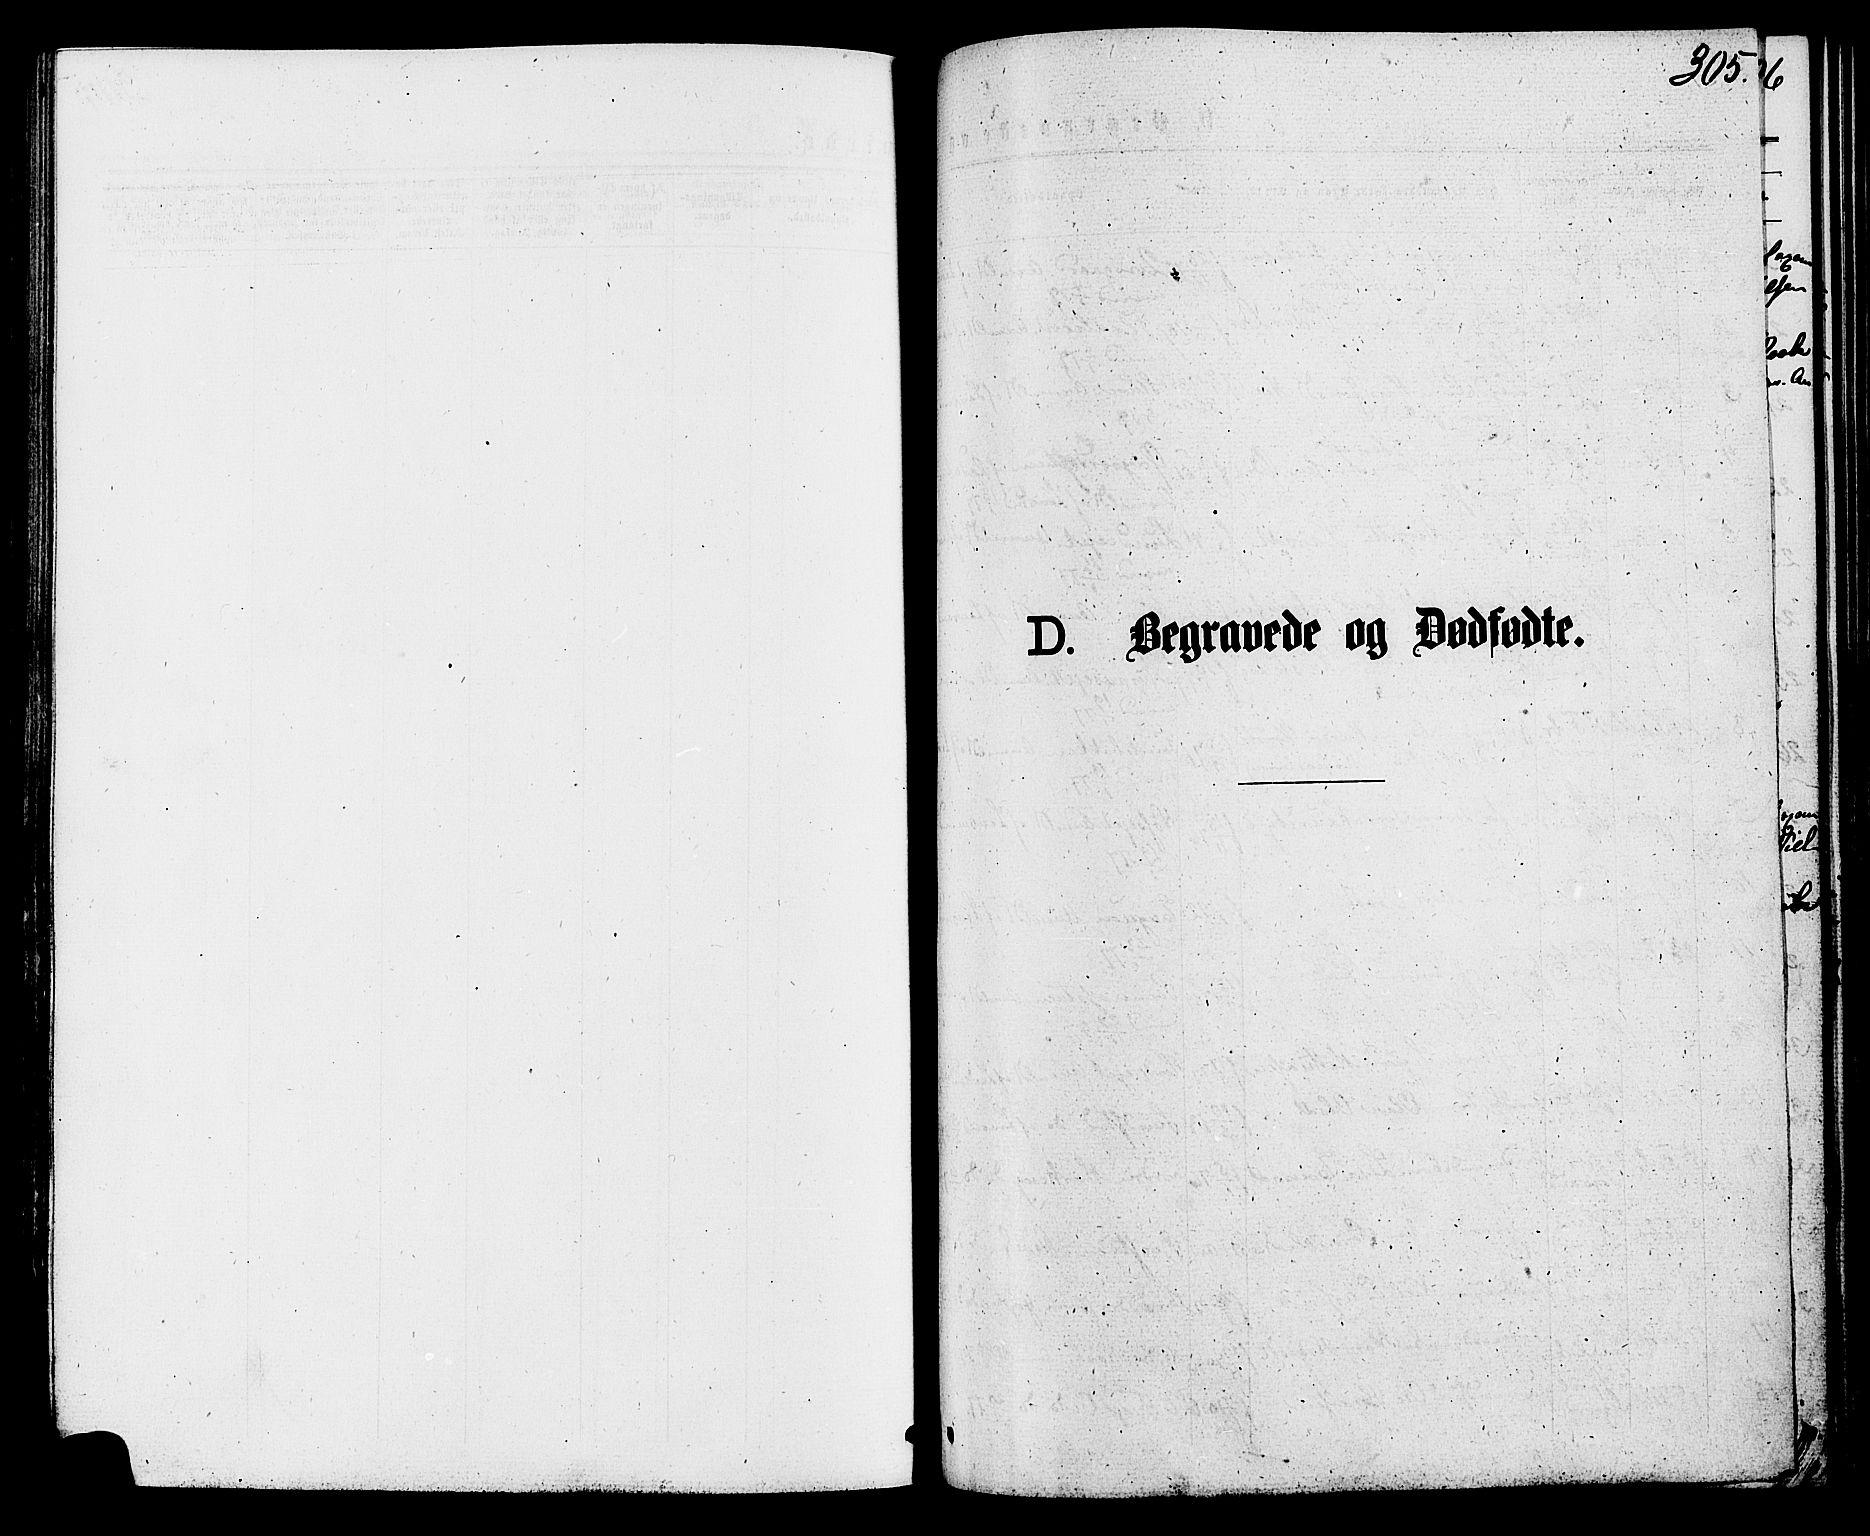 SAH, Biri prestekontor, Ministerialbok nr. 6, 1877-1886, s. 305